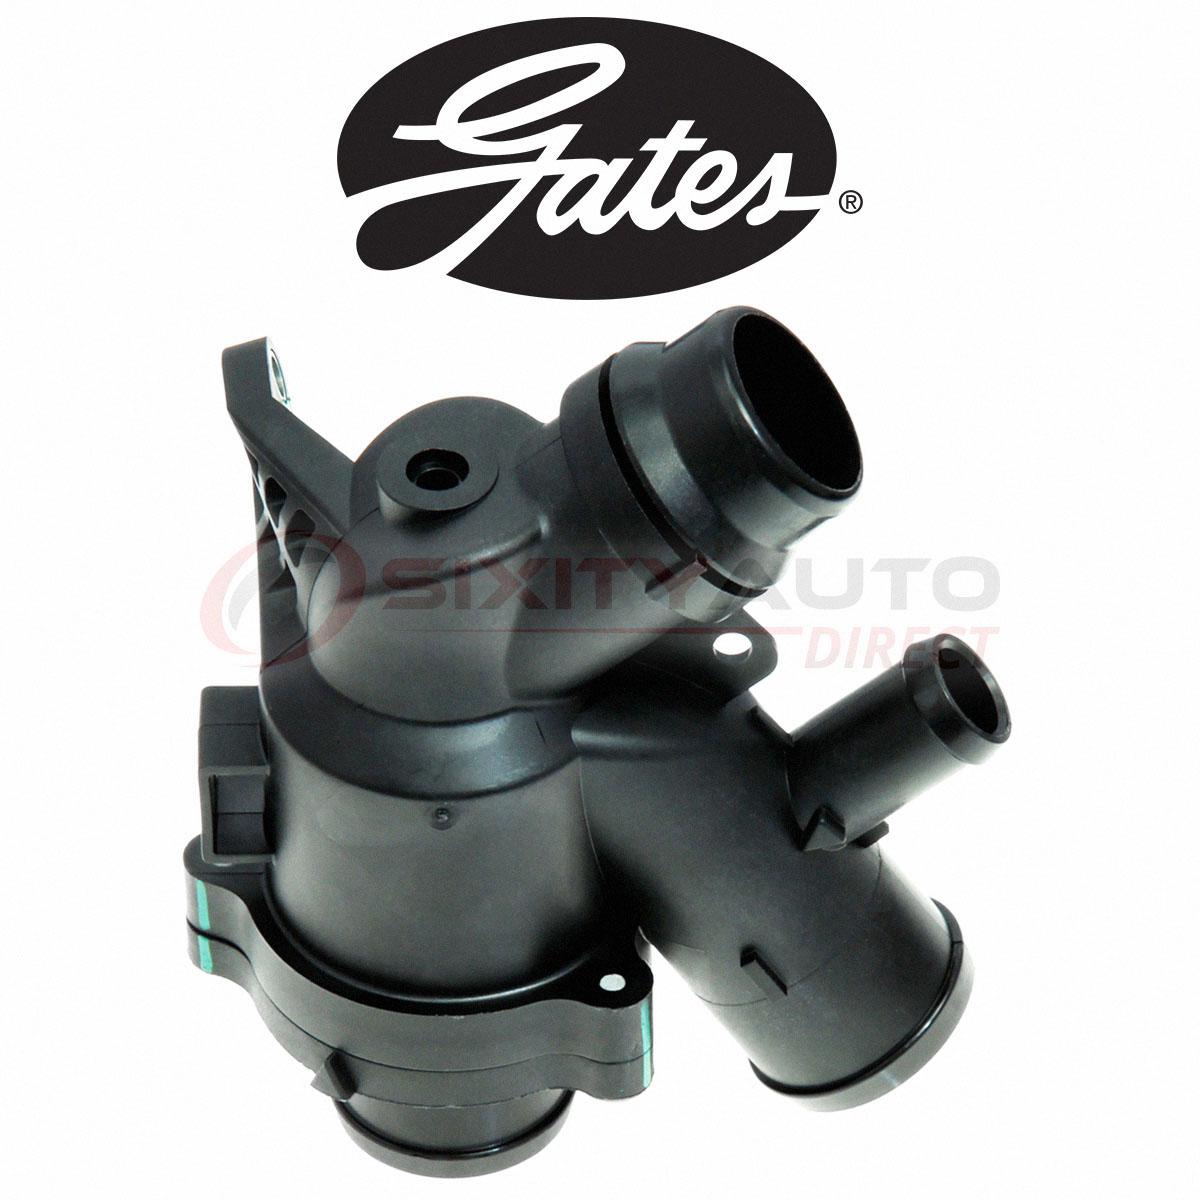 Gates Coolant Thermostat Housing Gasket for 1996-2001 Ford Explorer 5.0L V8 yb